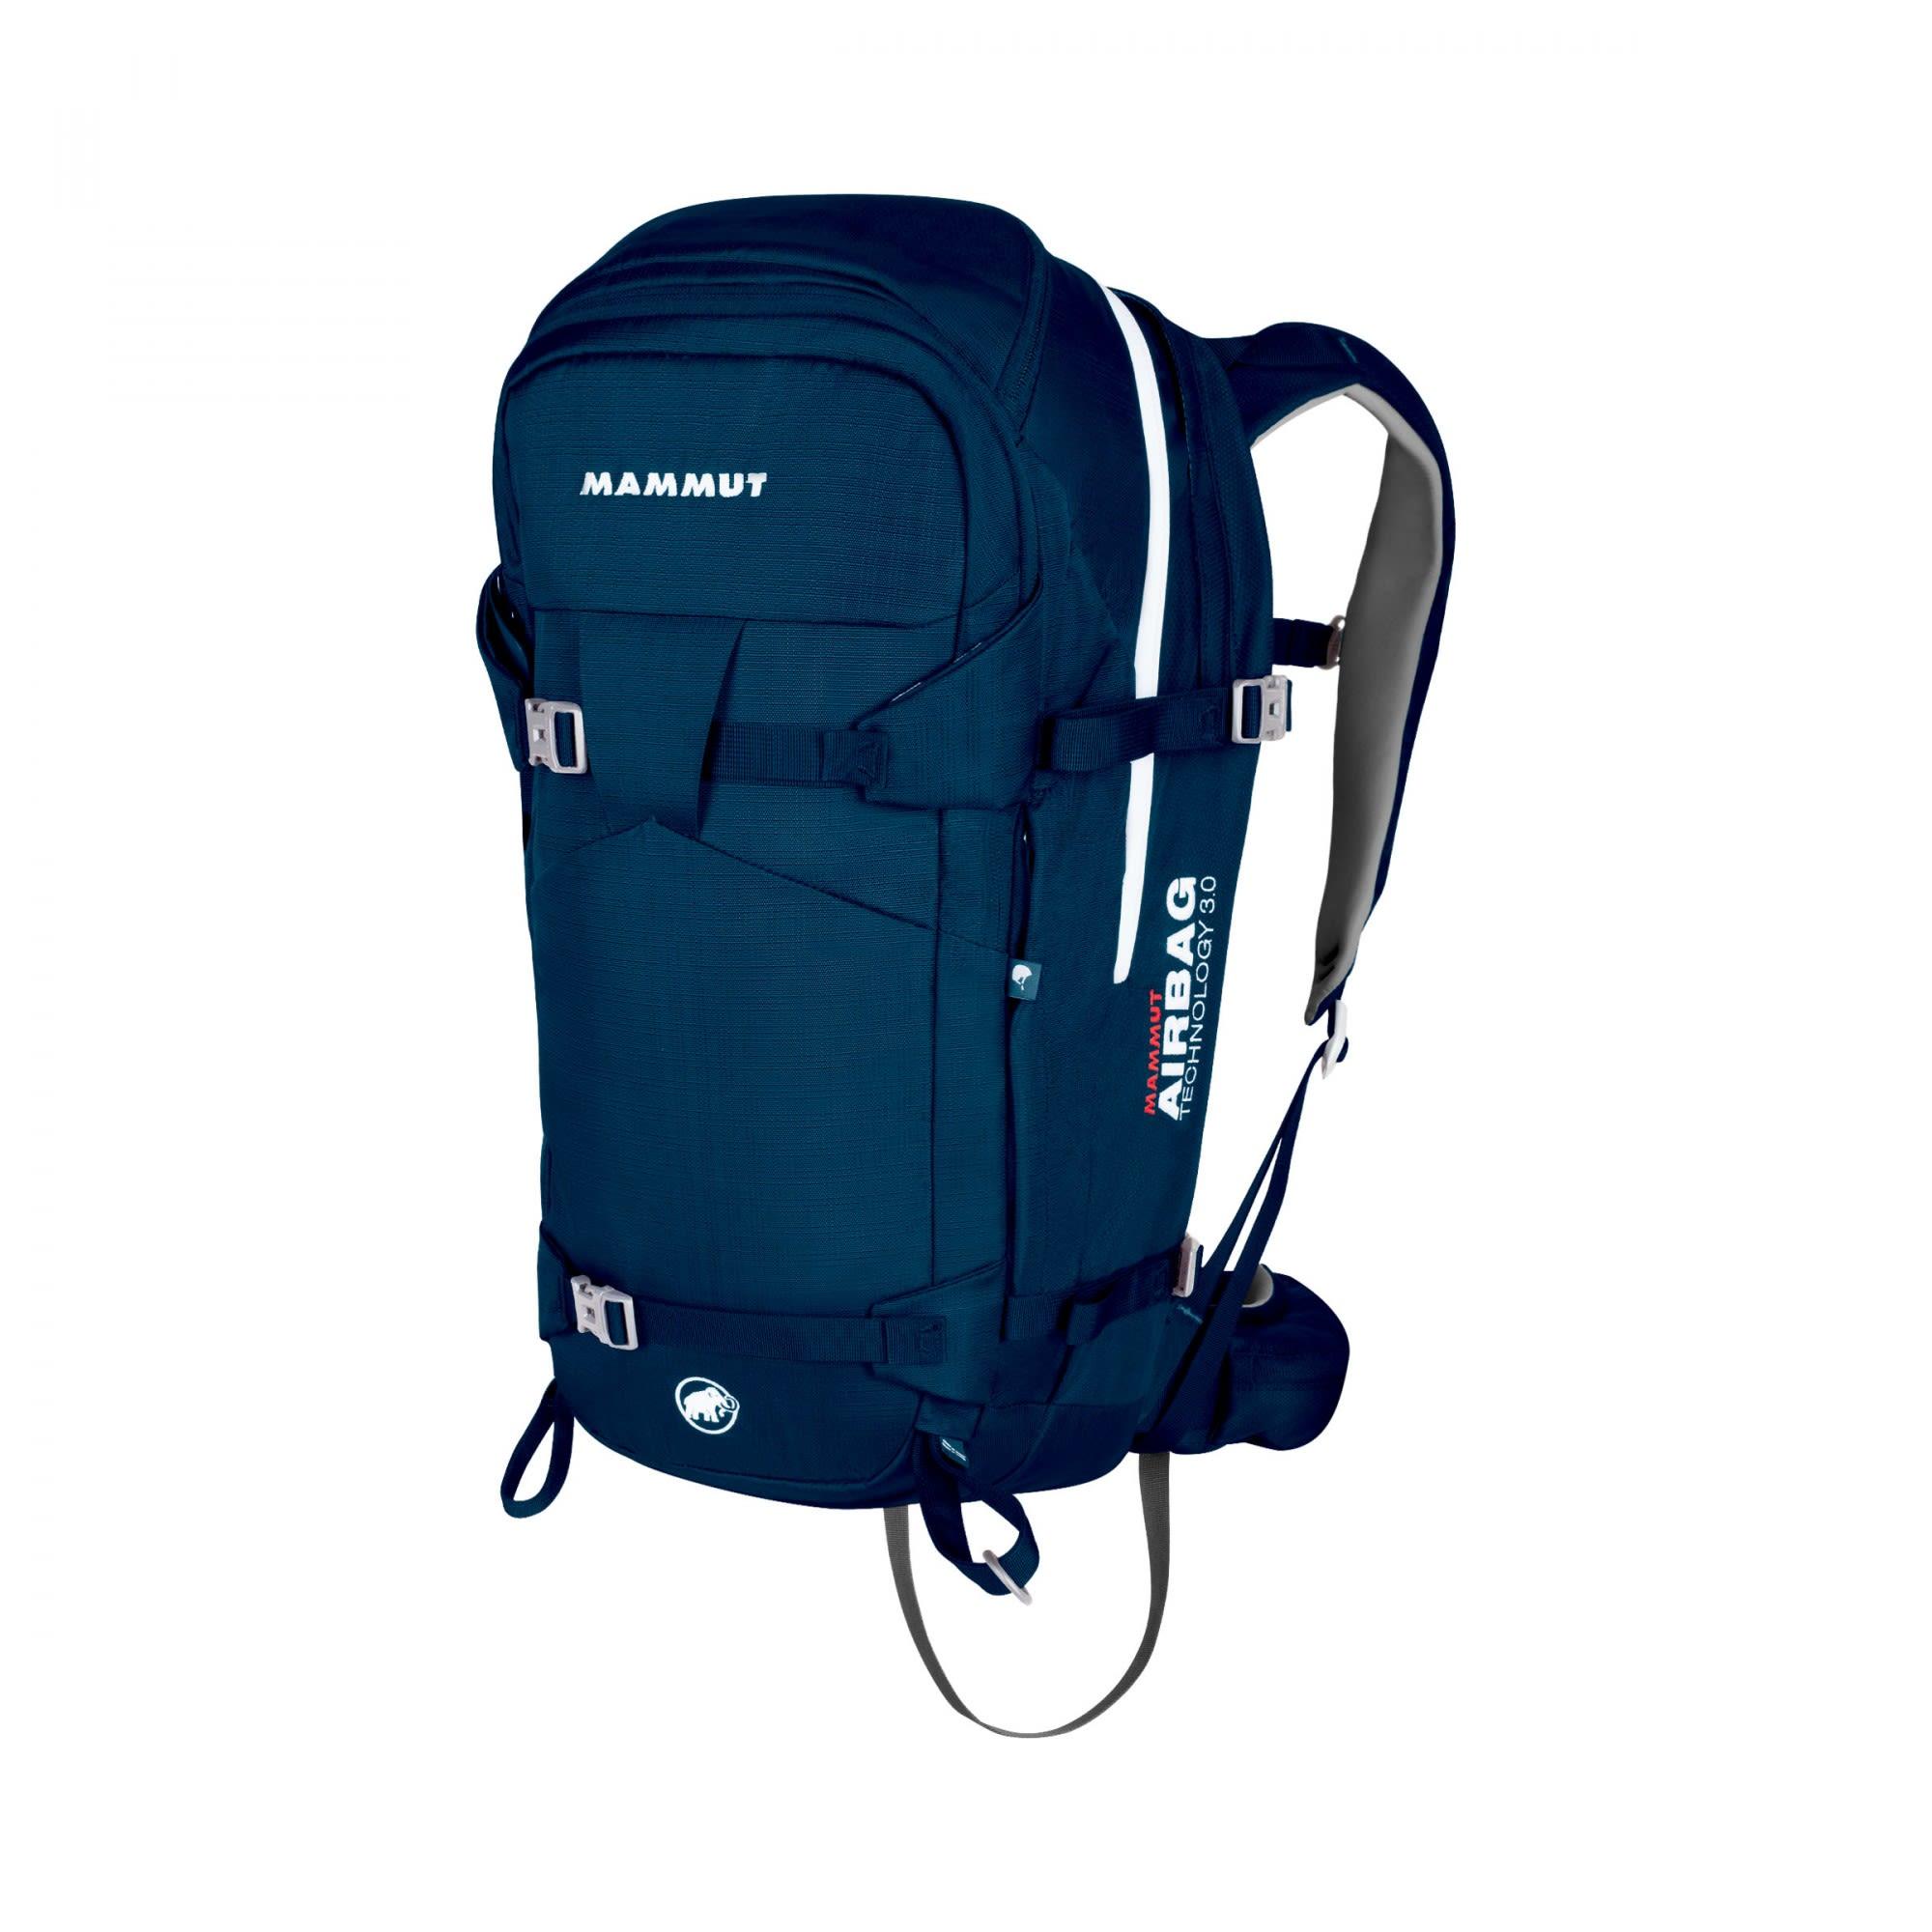 Mammut Pro Short Removable Airbag 3.0 Blau, Female Lawinenrucksack, 31l